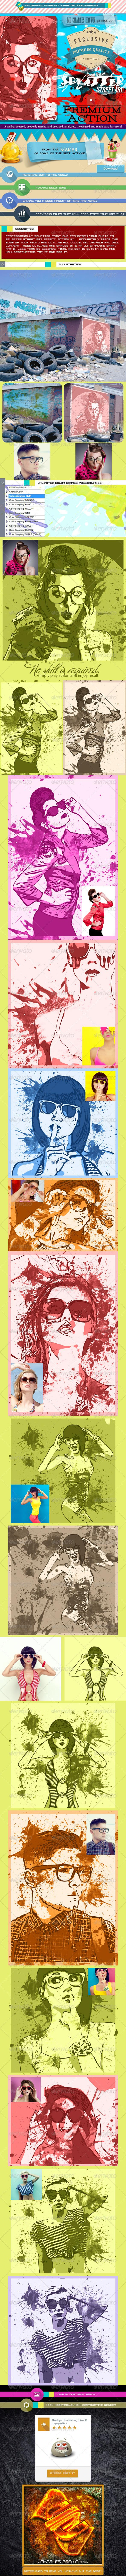 GraphicRiver Creative Splatter Street Art 6254002